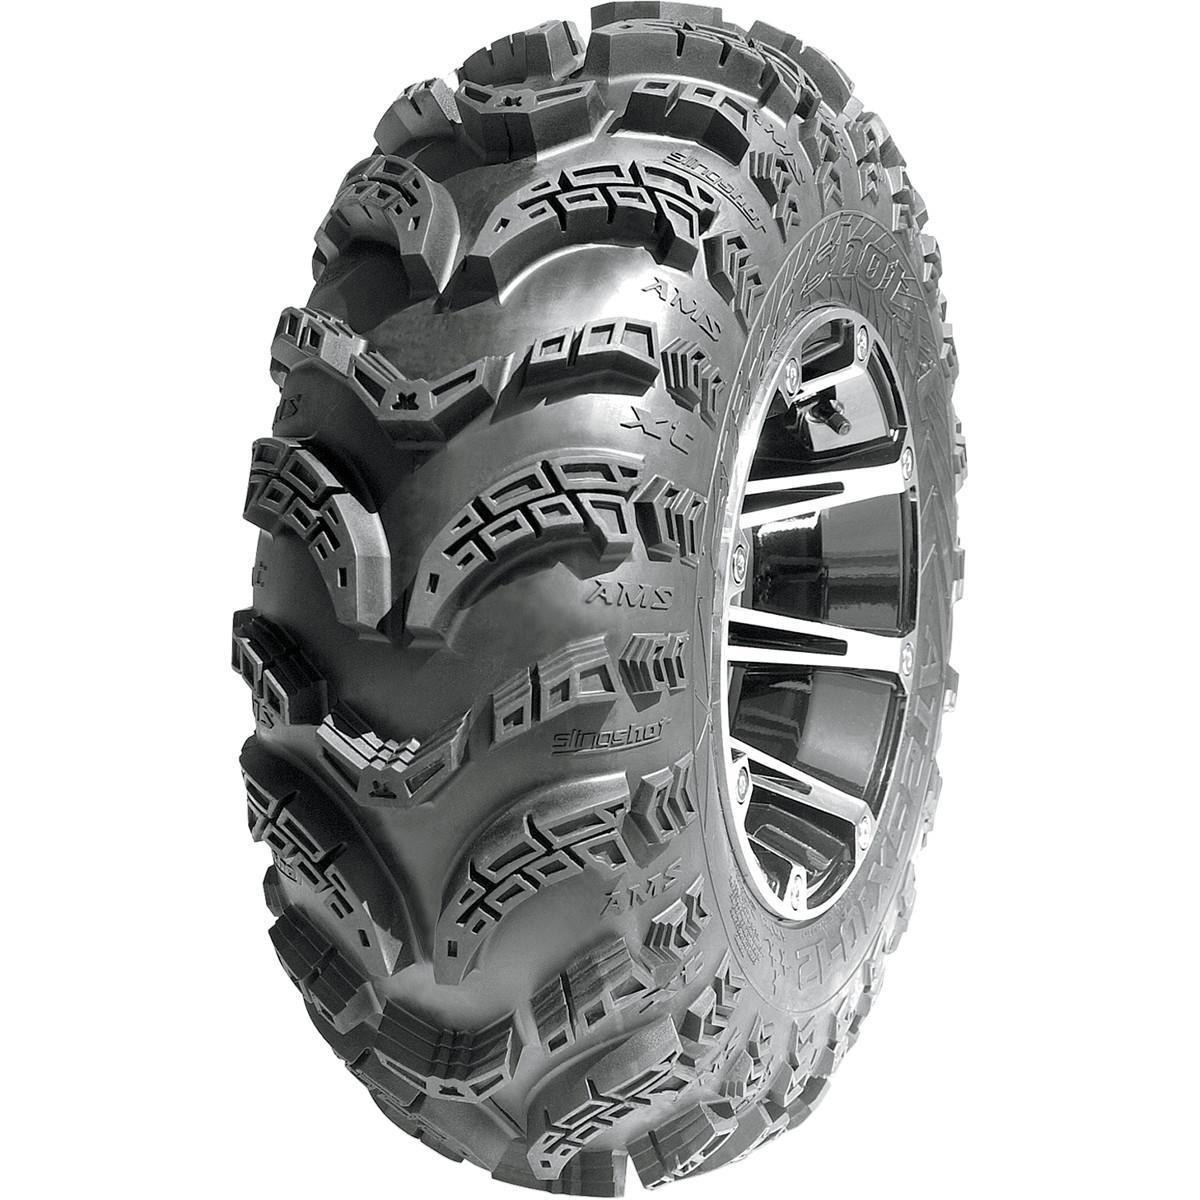 Slingshot XT Tires